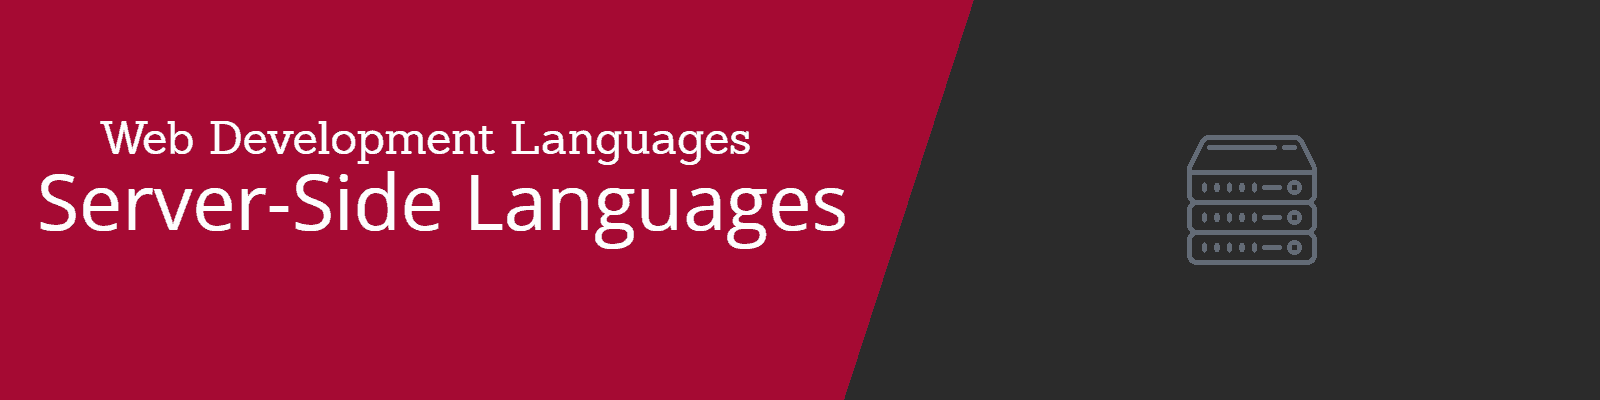 Programming and Web Development Server-Side Languages